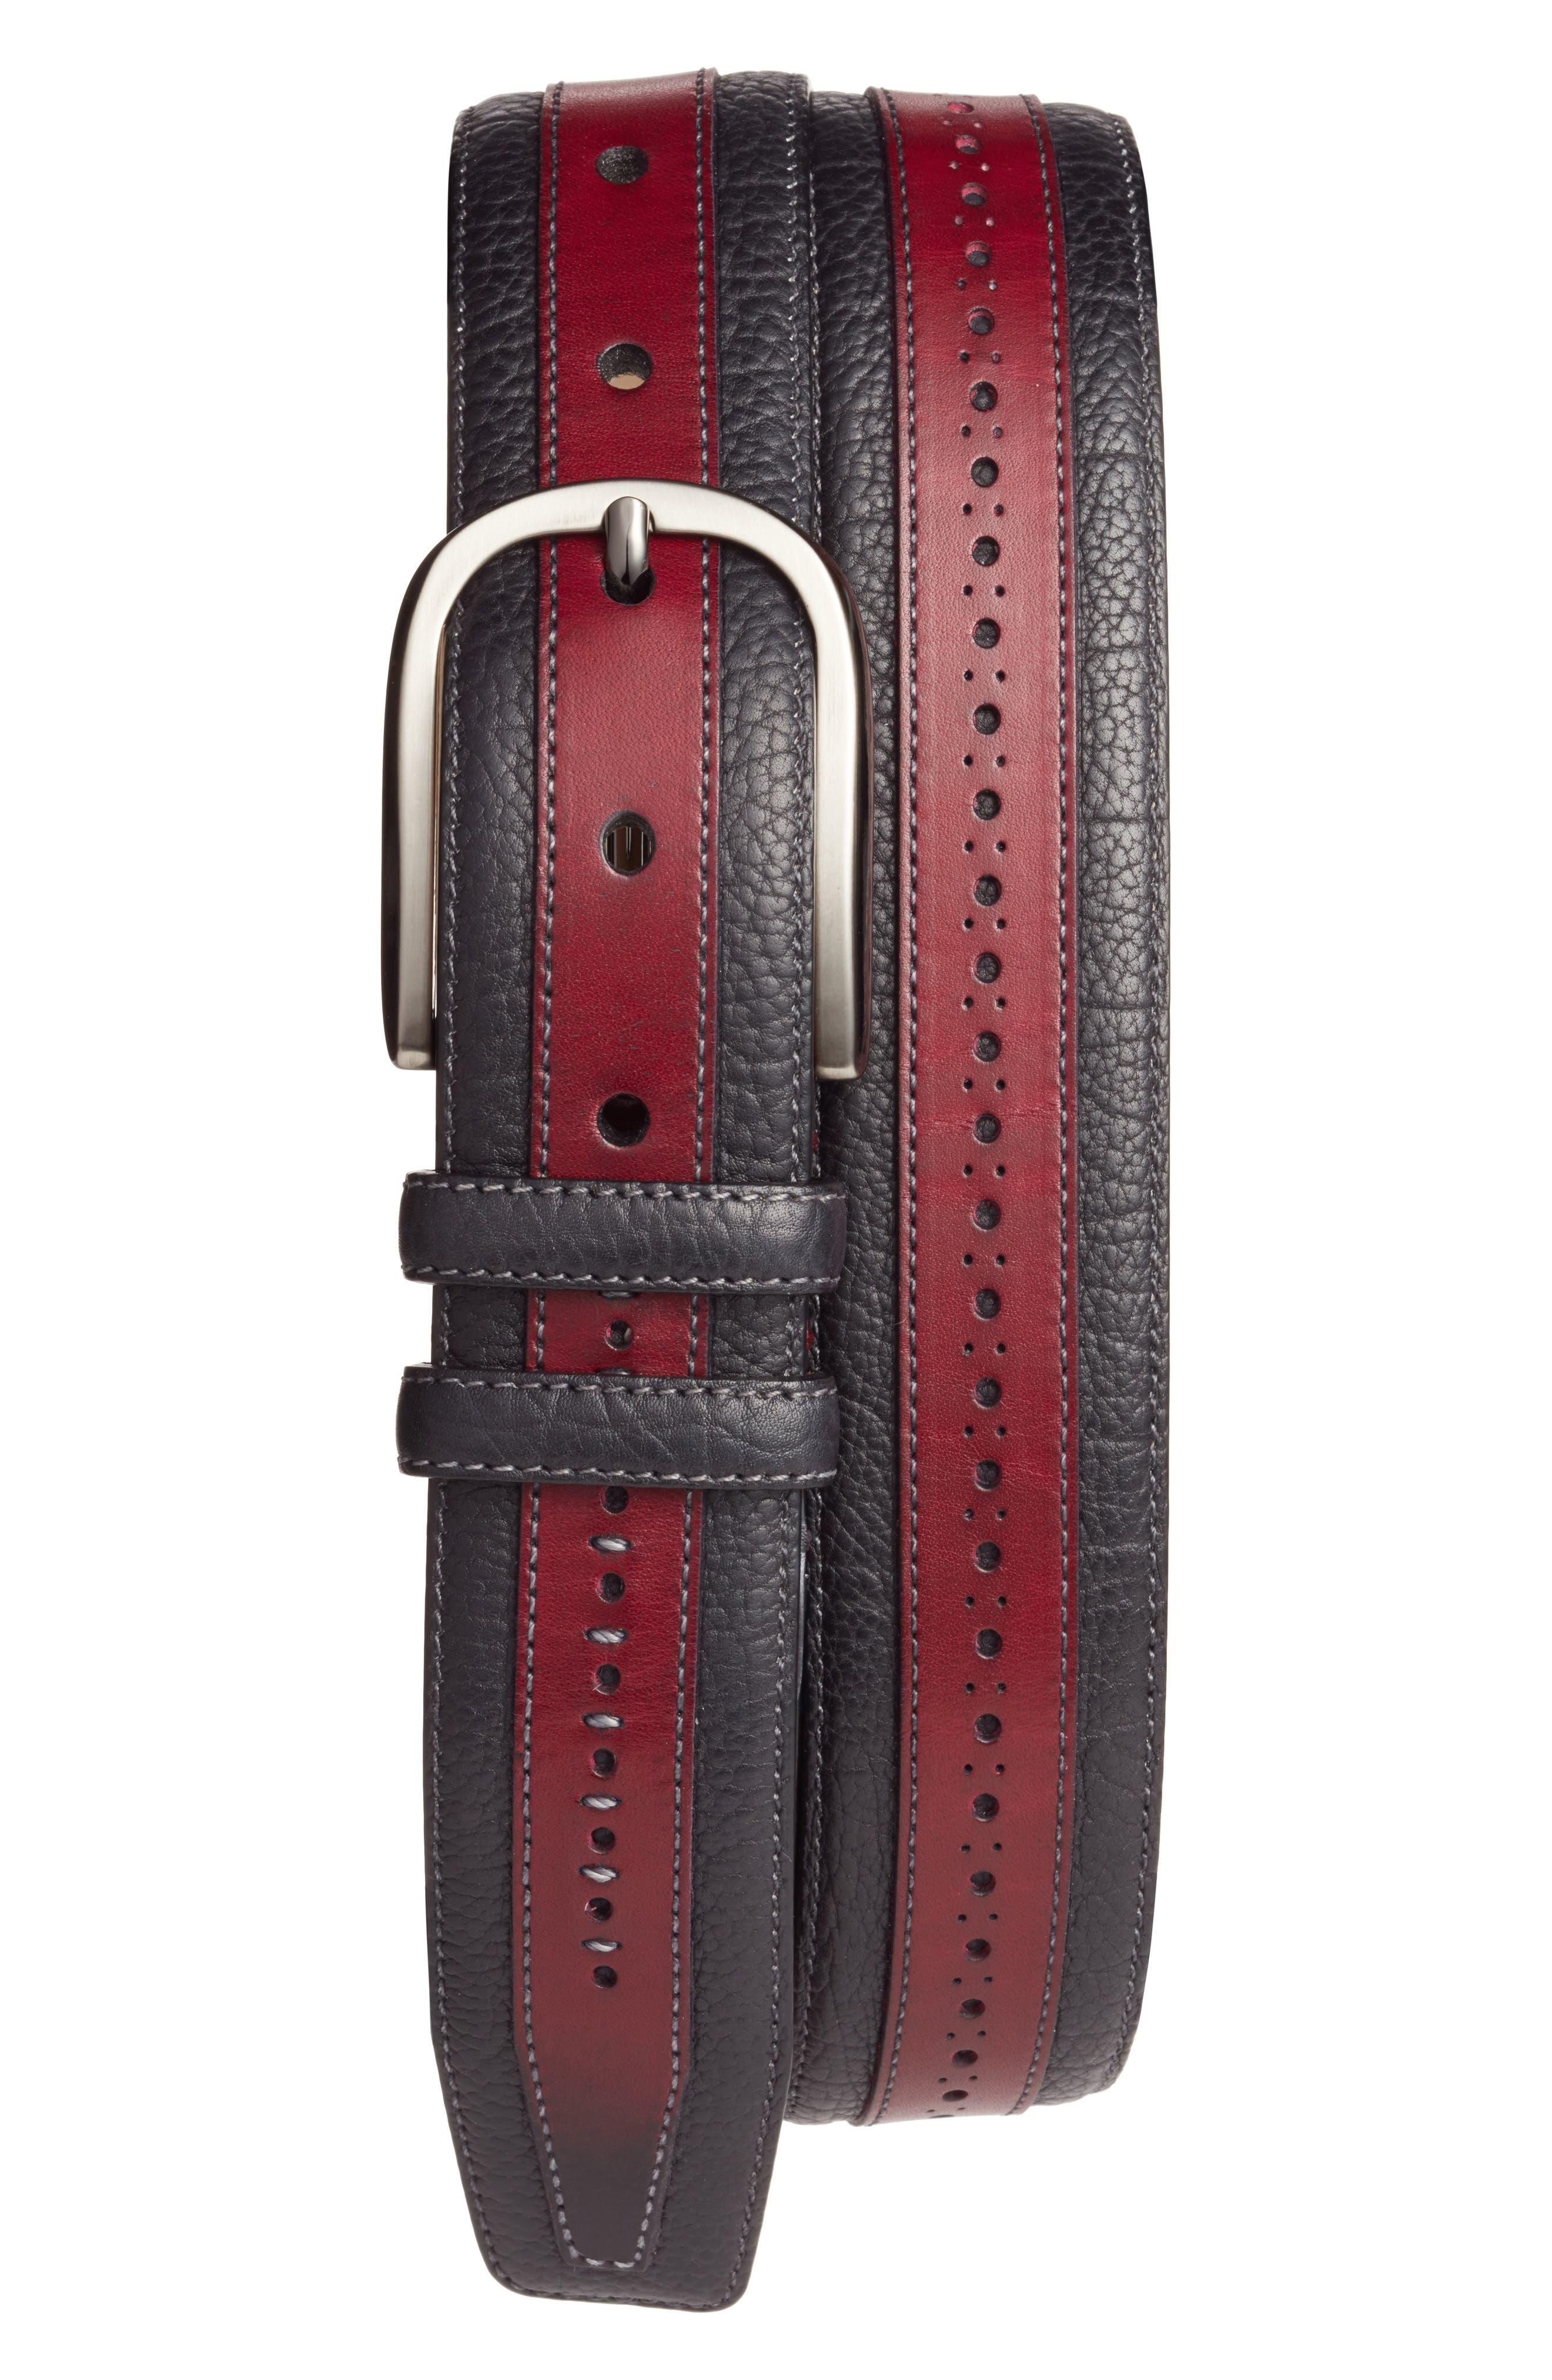 Palma Leather Belt,                         Main,                         color, Burgundy/ Black